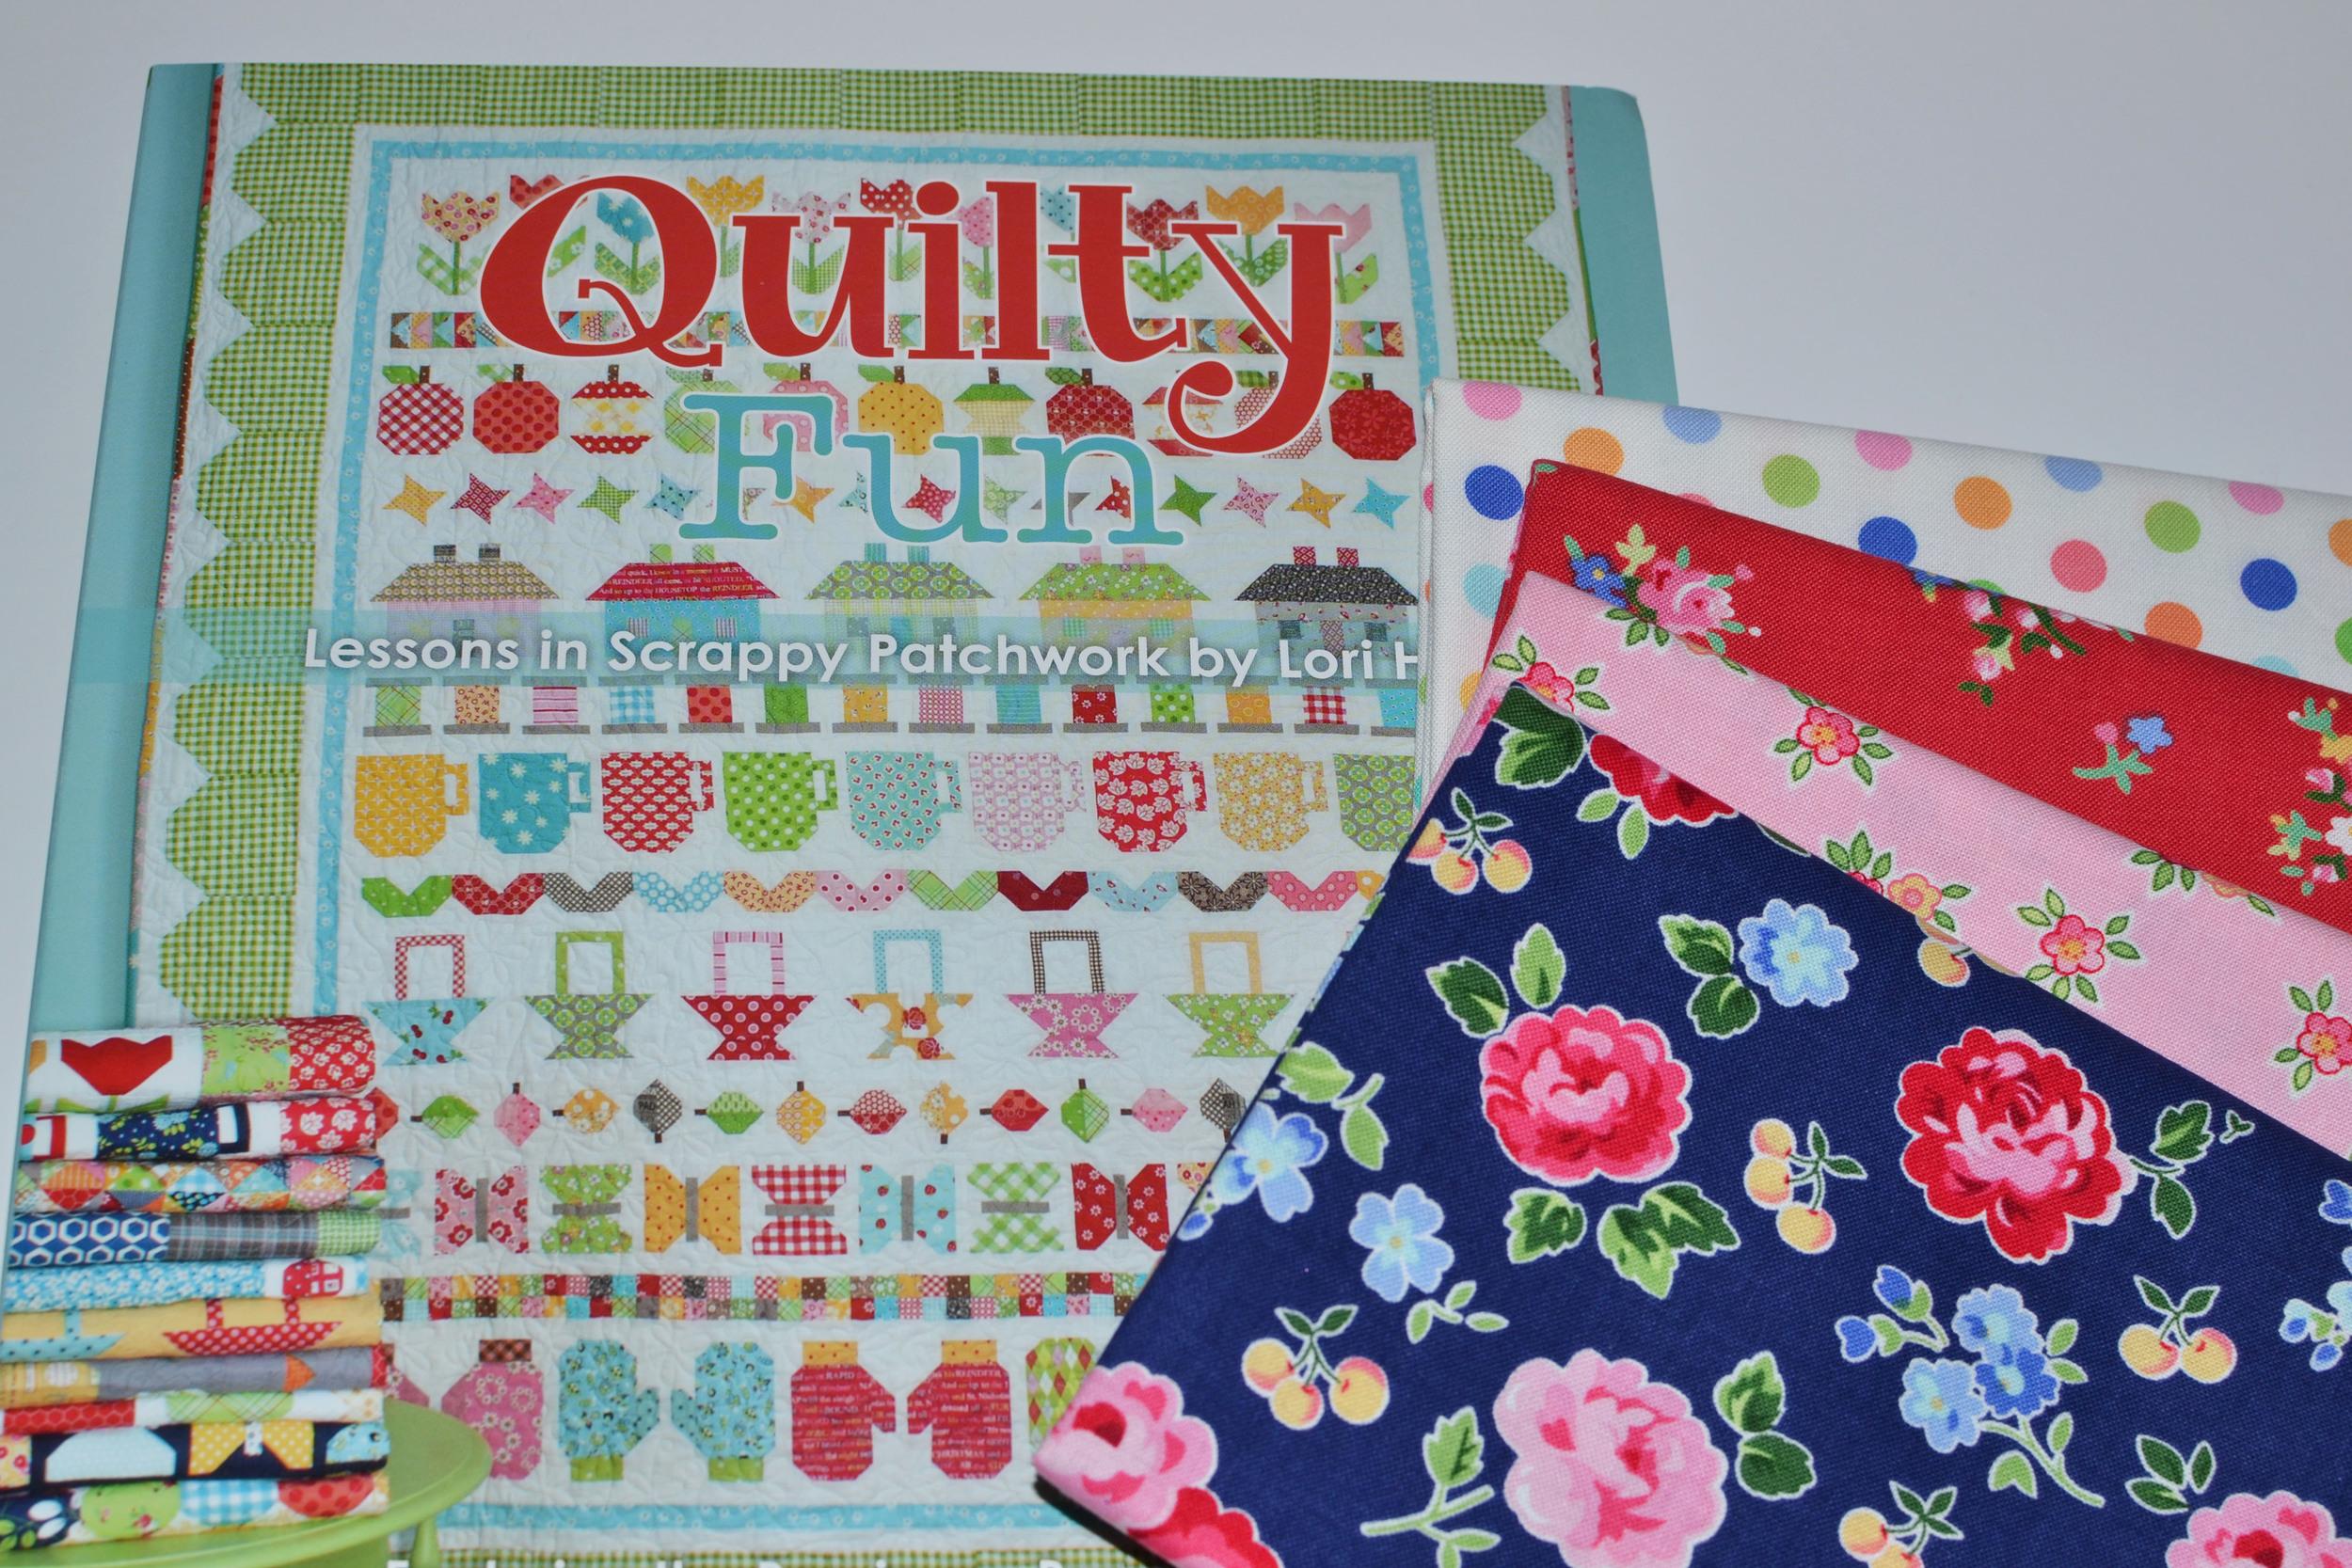 quilty fun honeycombs 1 edit.jpg